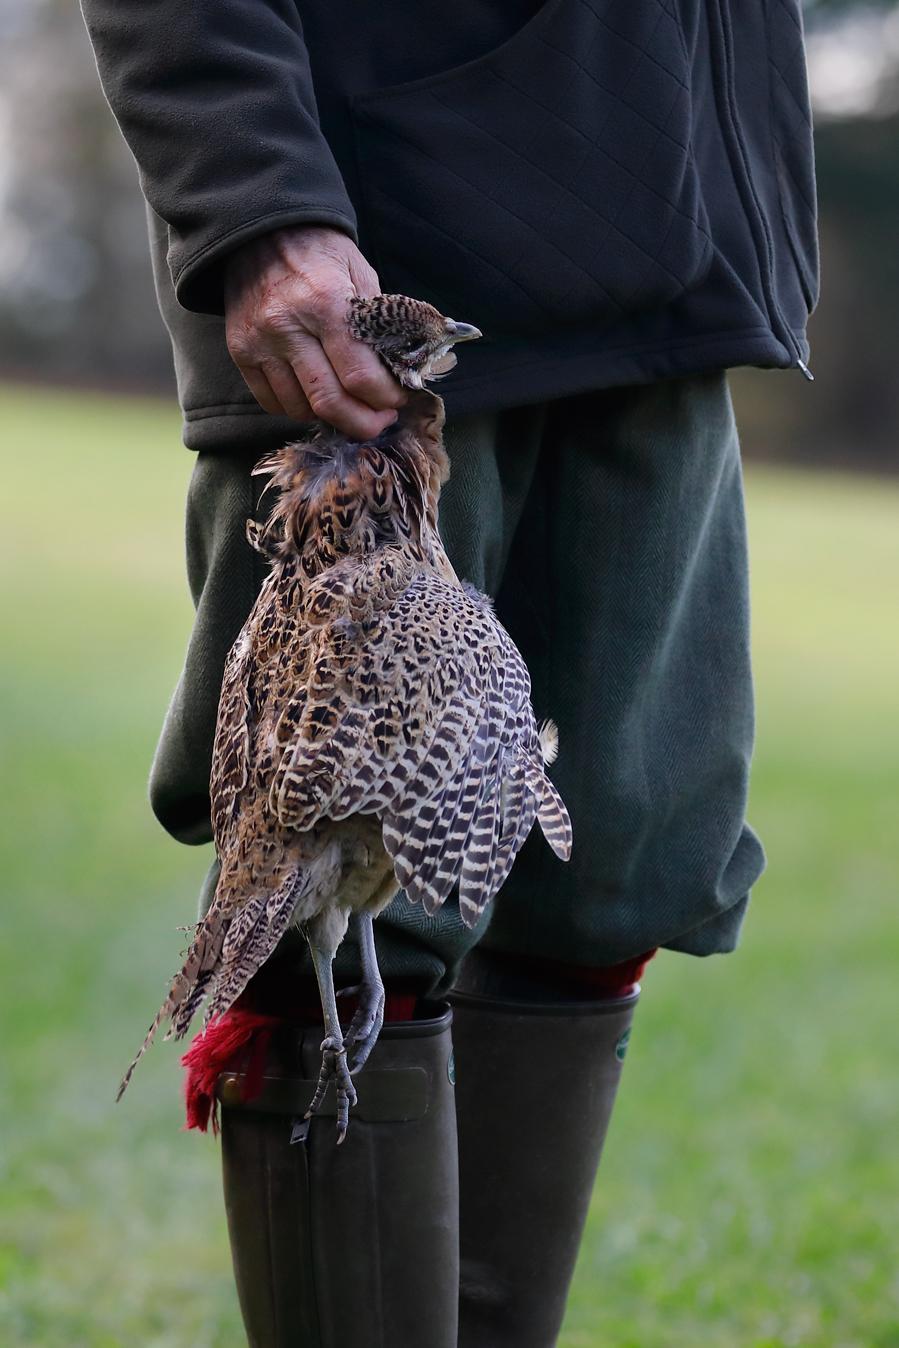 Field sports photography. Hen pheasant